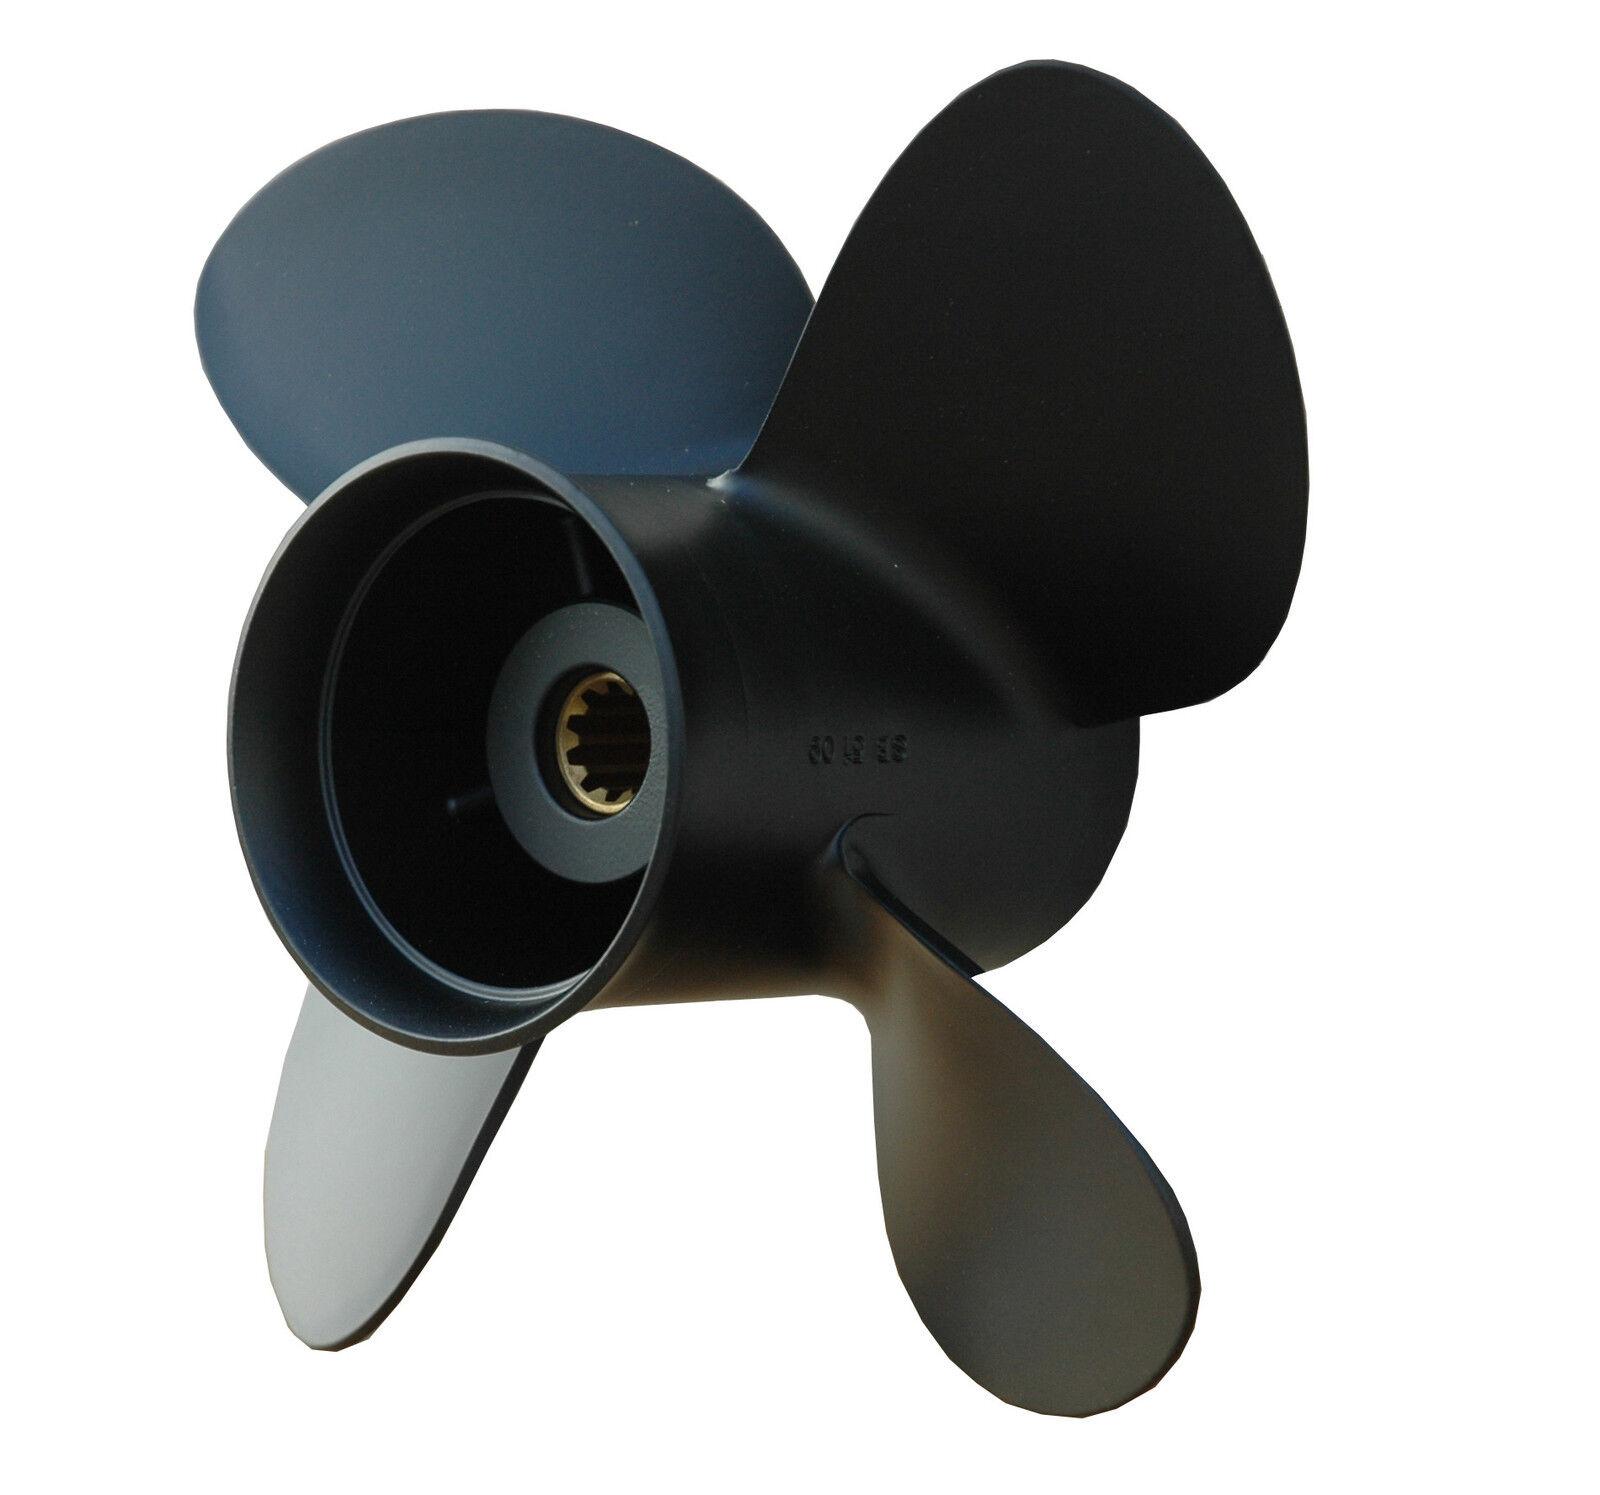 SOLAS Propeller Alu 4 - 11 2/5 x 10 für 50 Tohatsu 35; 40; 50 für & 55 PS f8ae0b